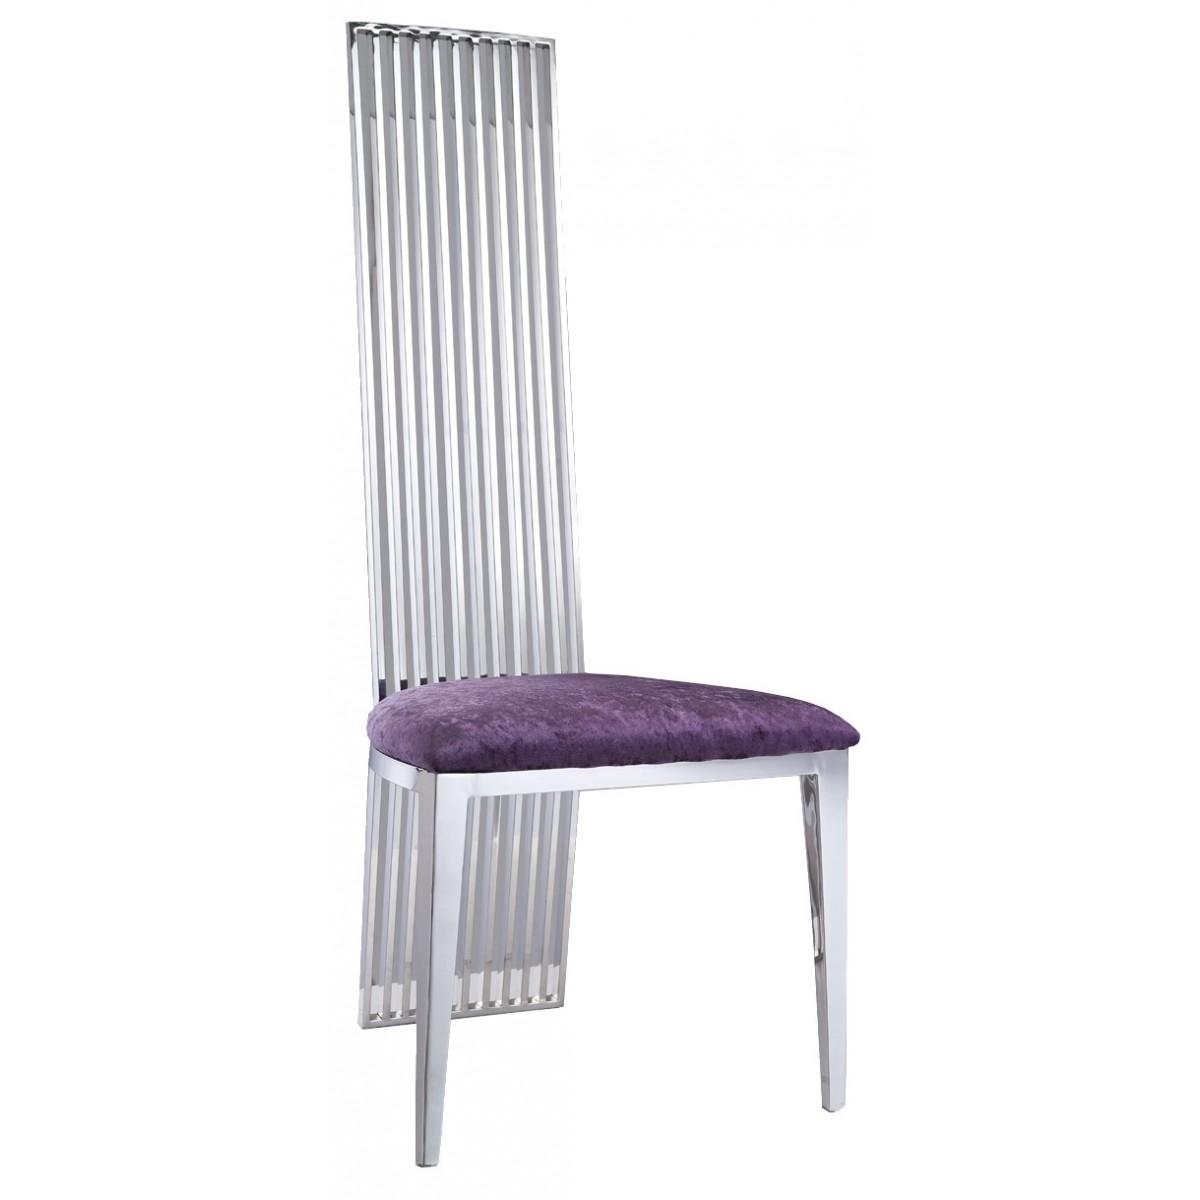 Chaise de salle manger en inox et velours sephora lot de 2 for Chaise velours salle a manger